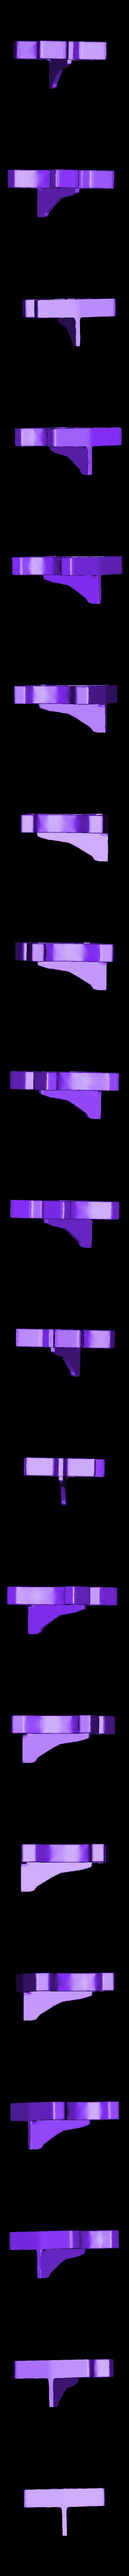 headdress_v3_by_Gr4zhopeR.stl Download free STL file Rubric Marines • 3D printer design, Mazer